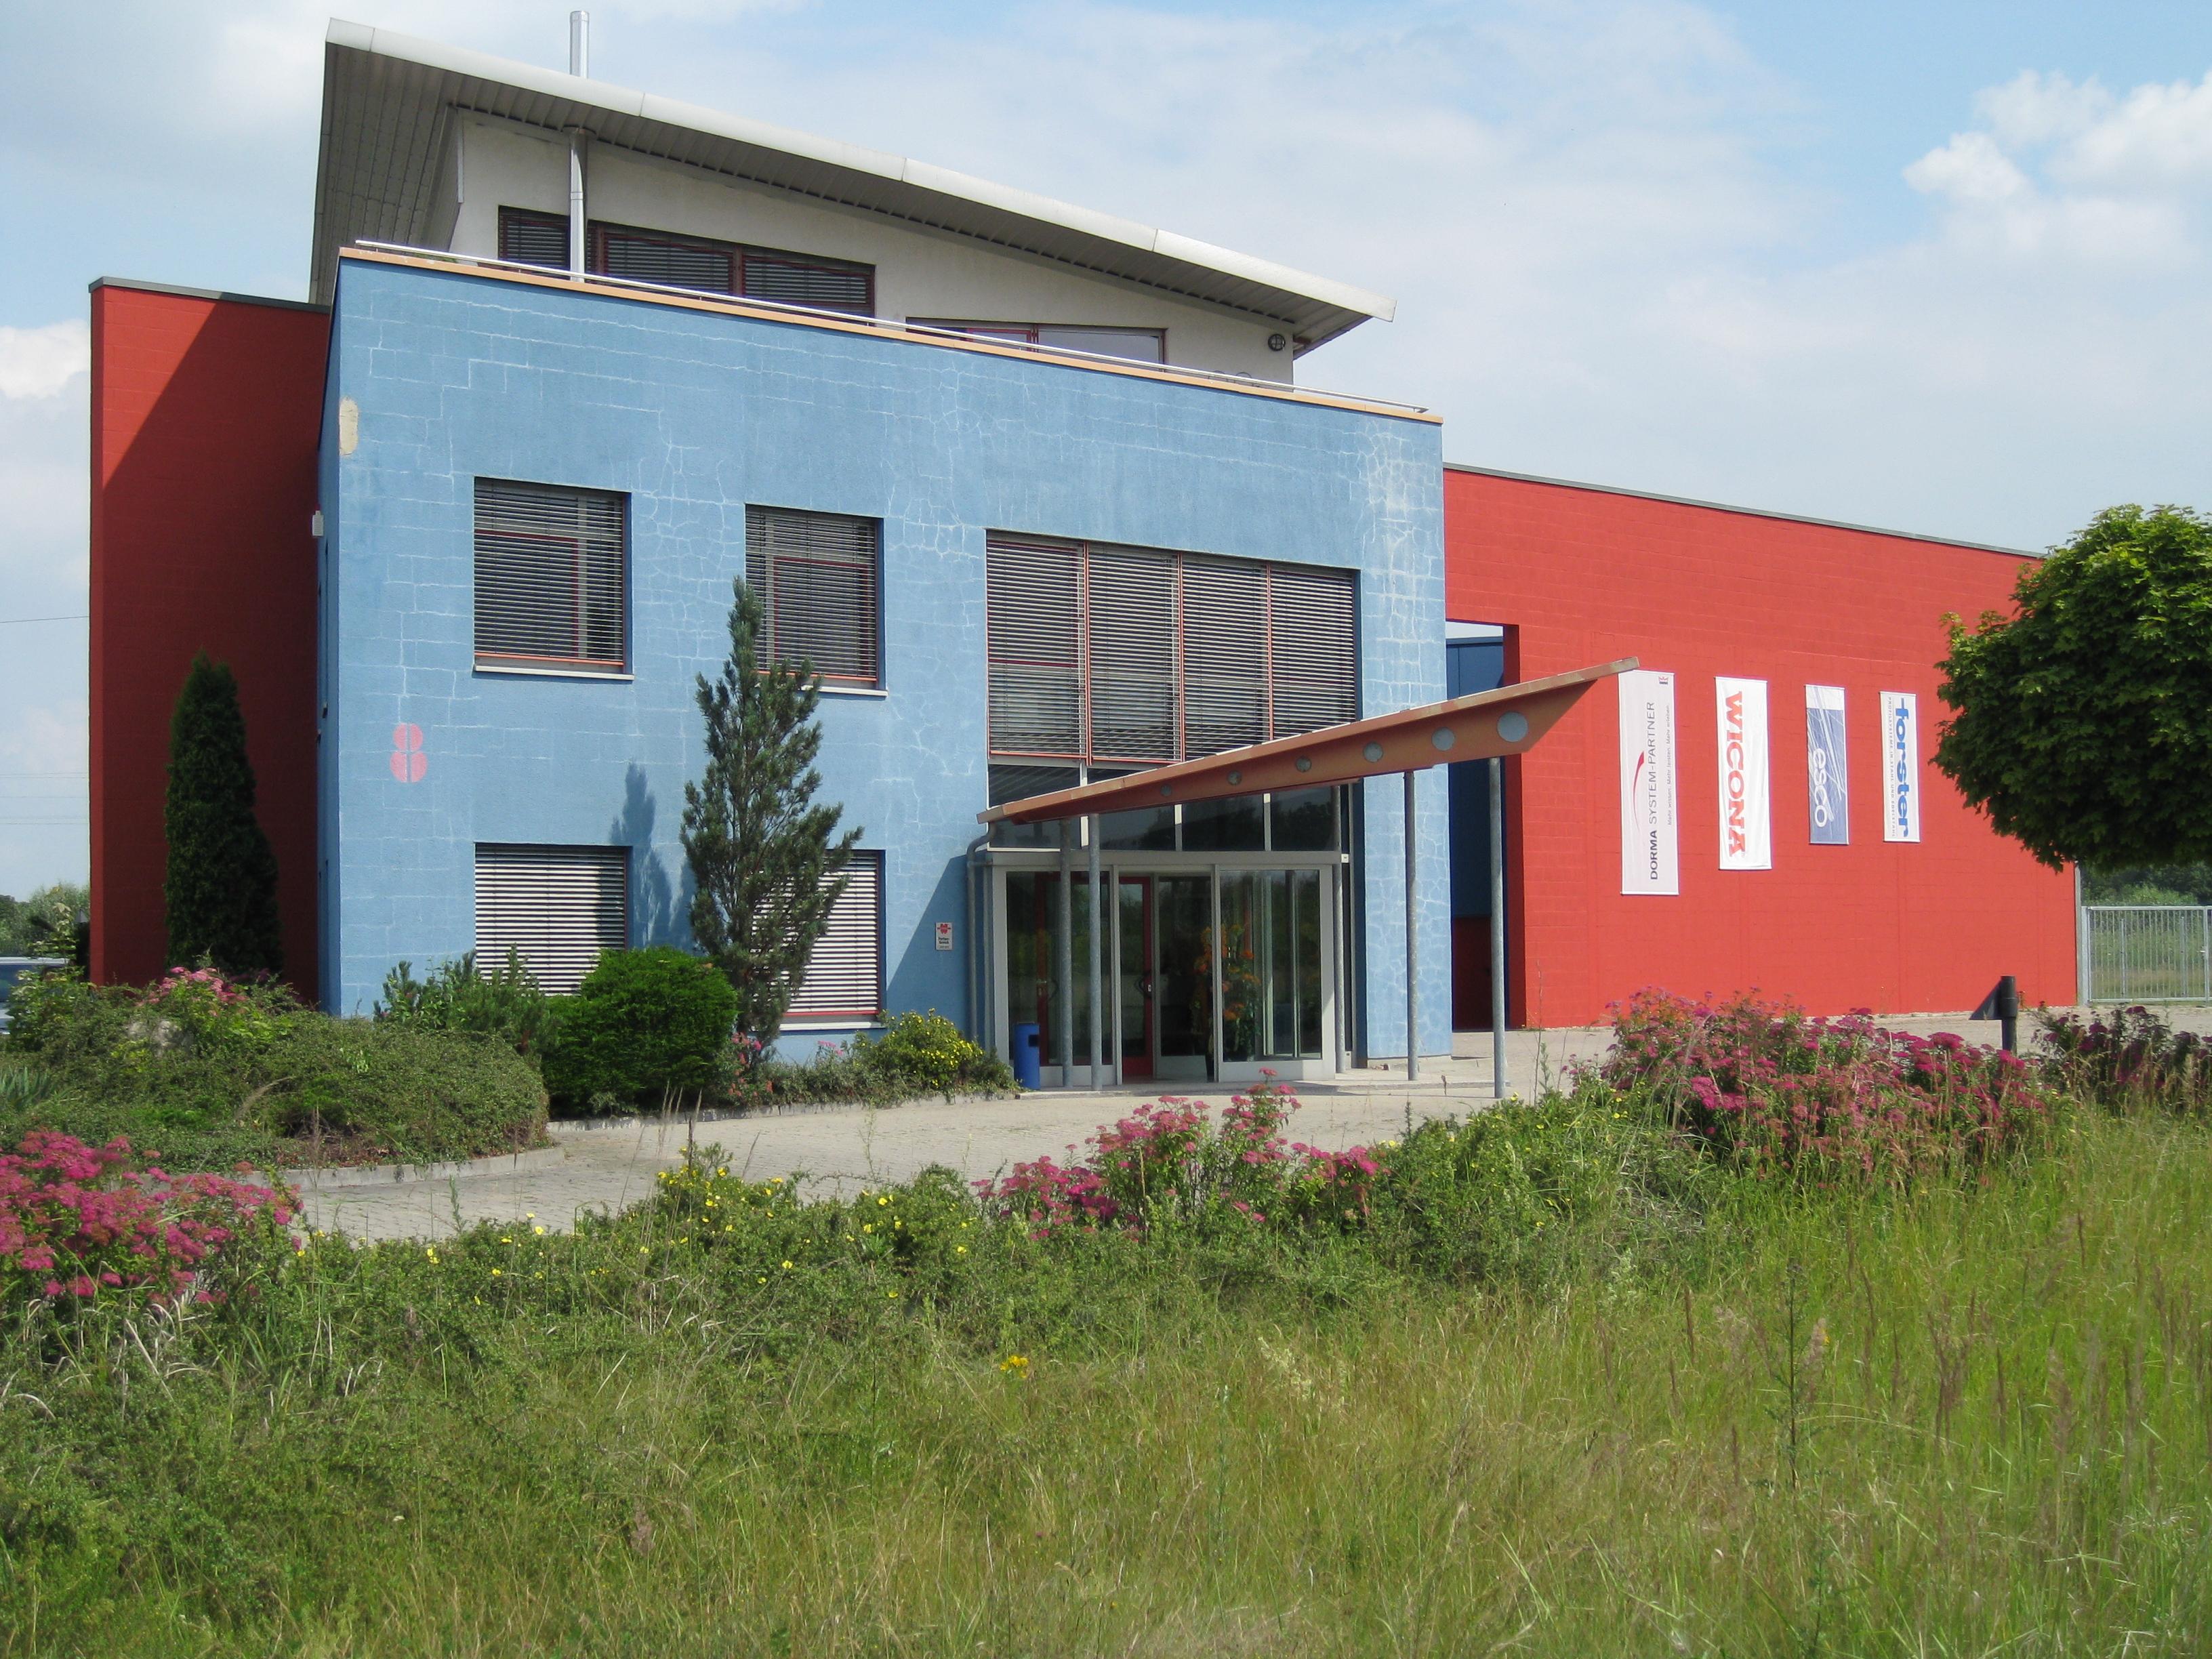 BRE-Brandschutzsysteme & Metallbau GmbH